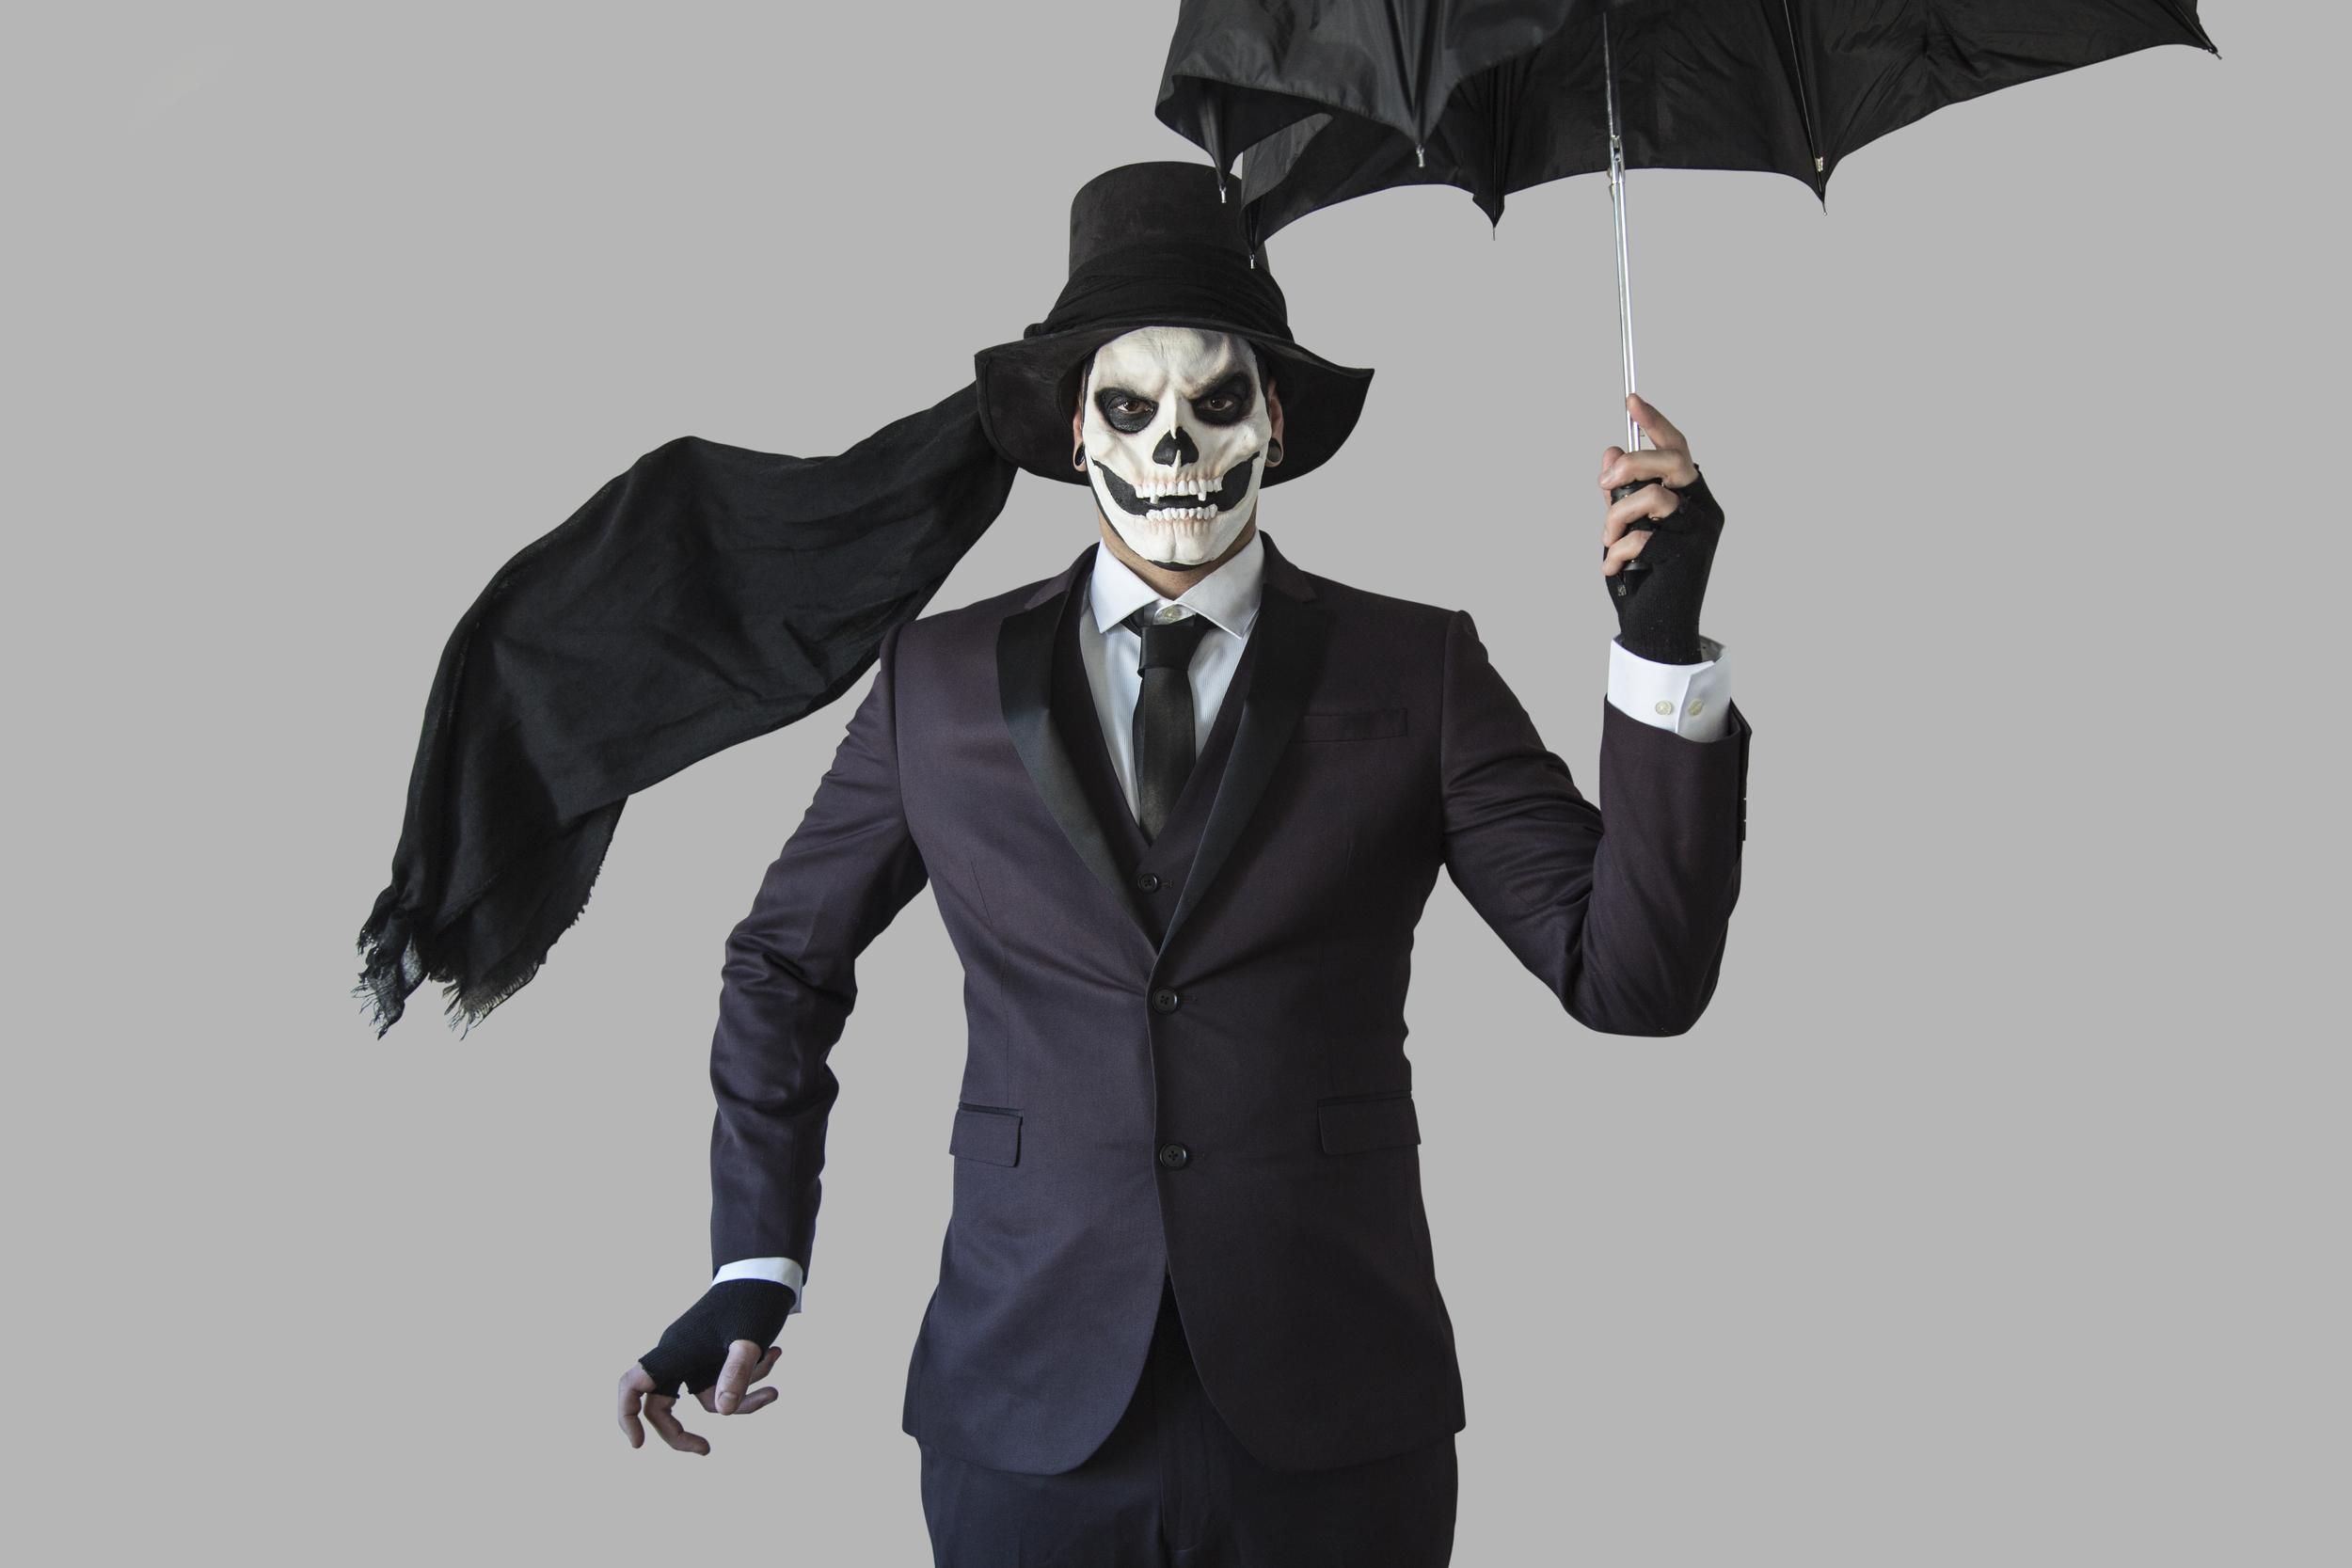 Gorey_Skeleton_Wide (1).jpg